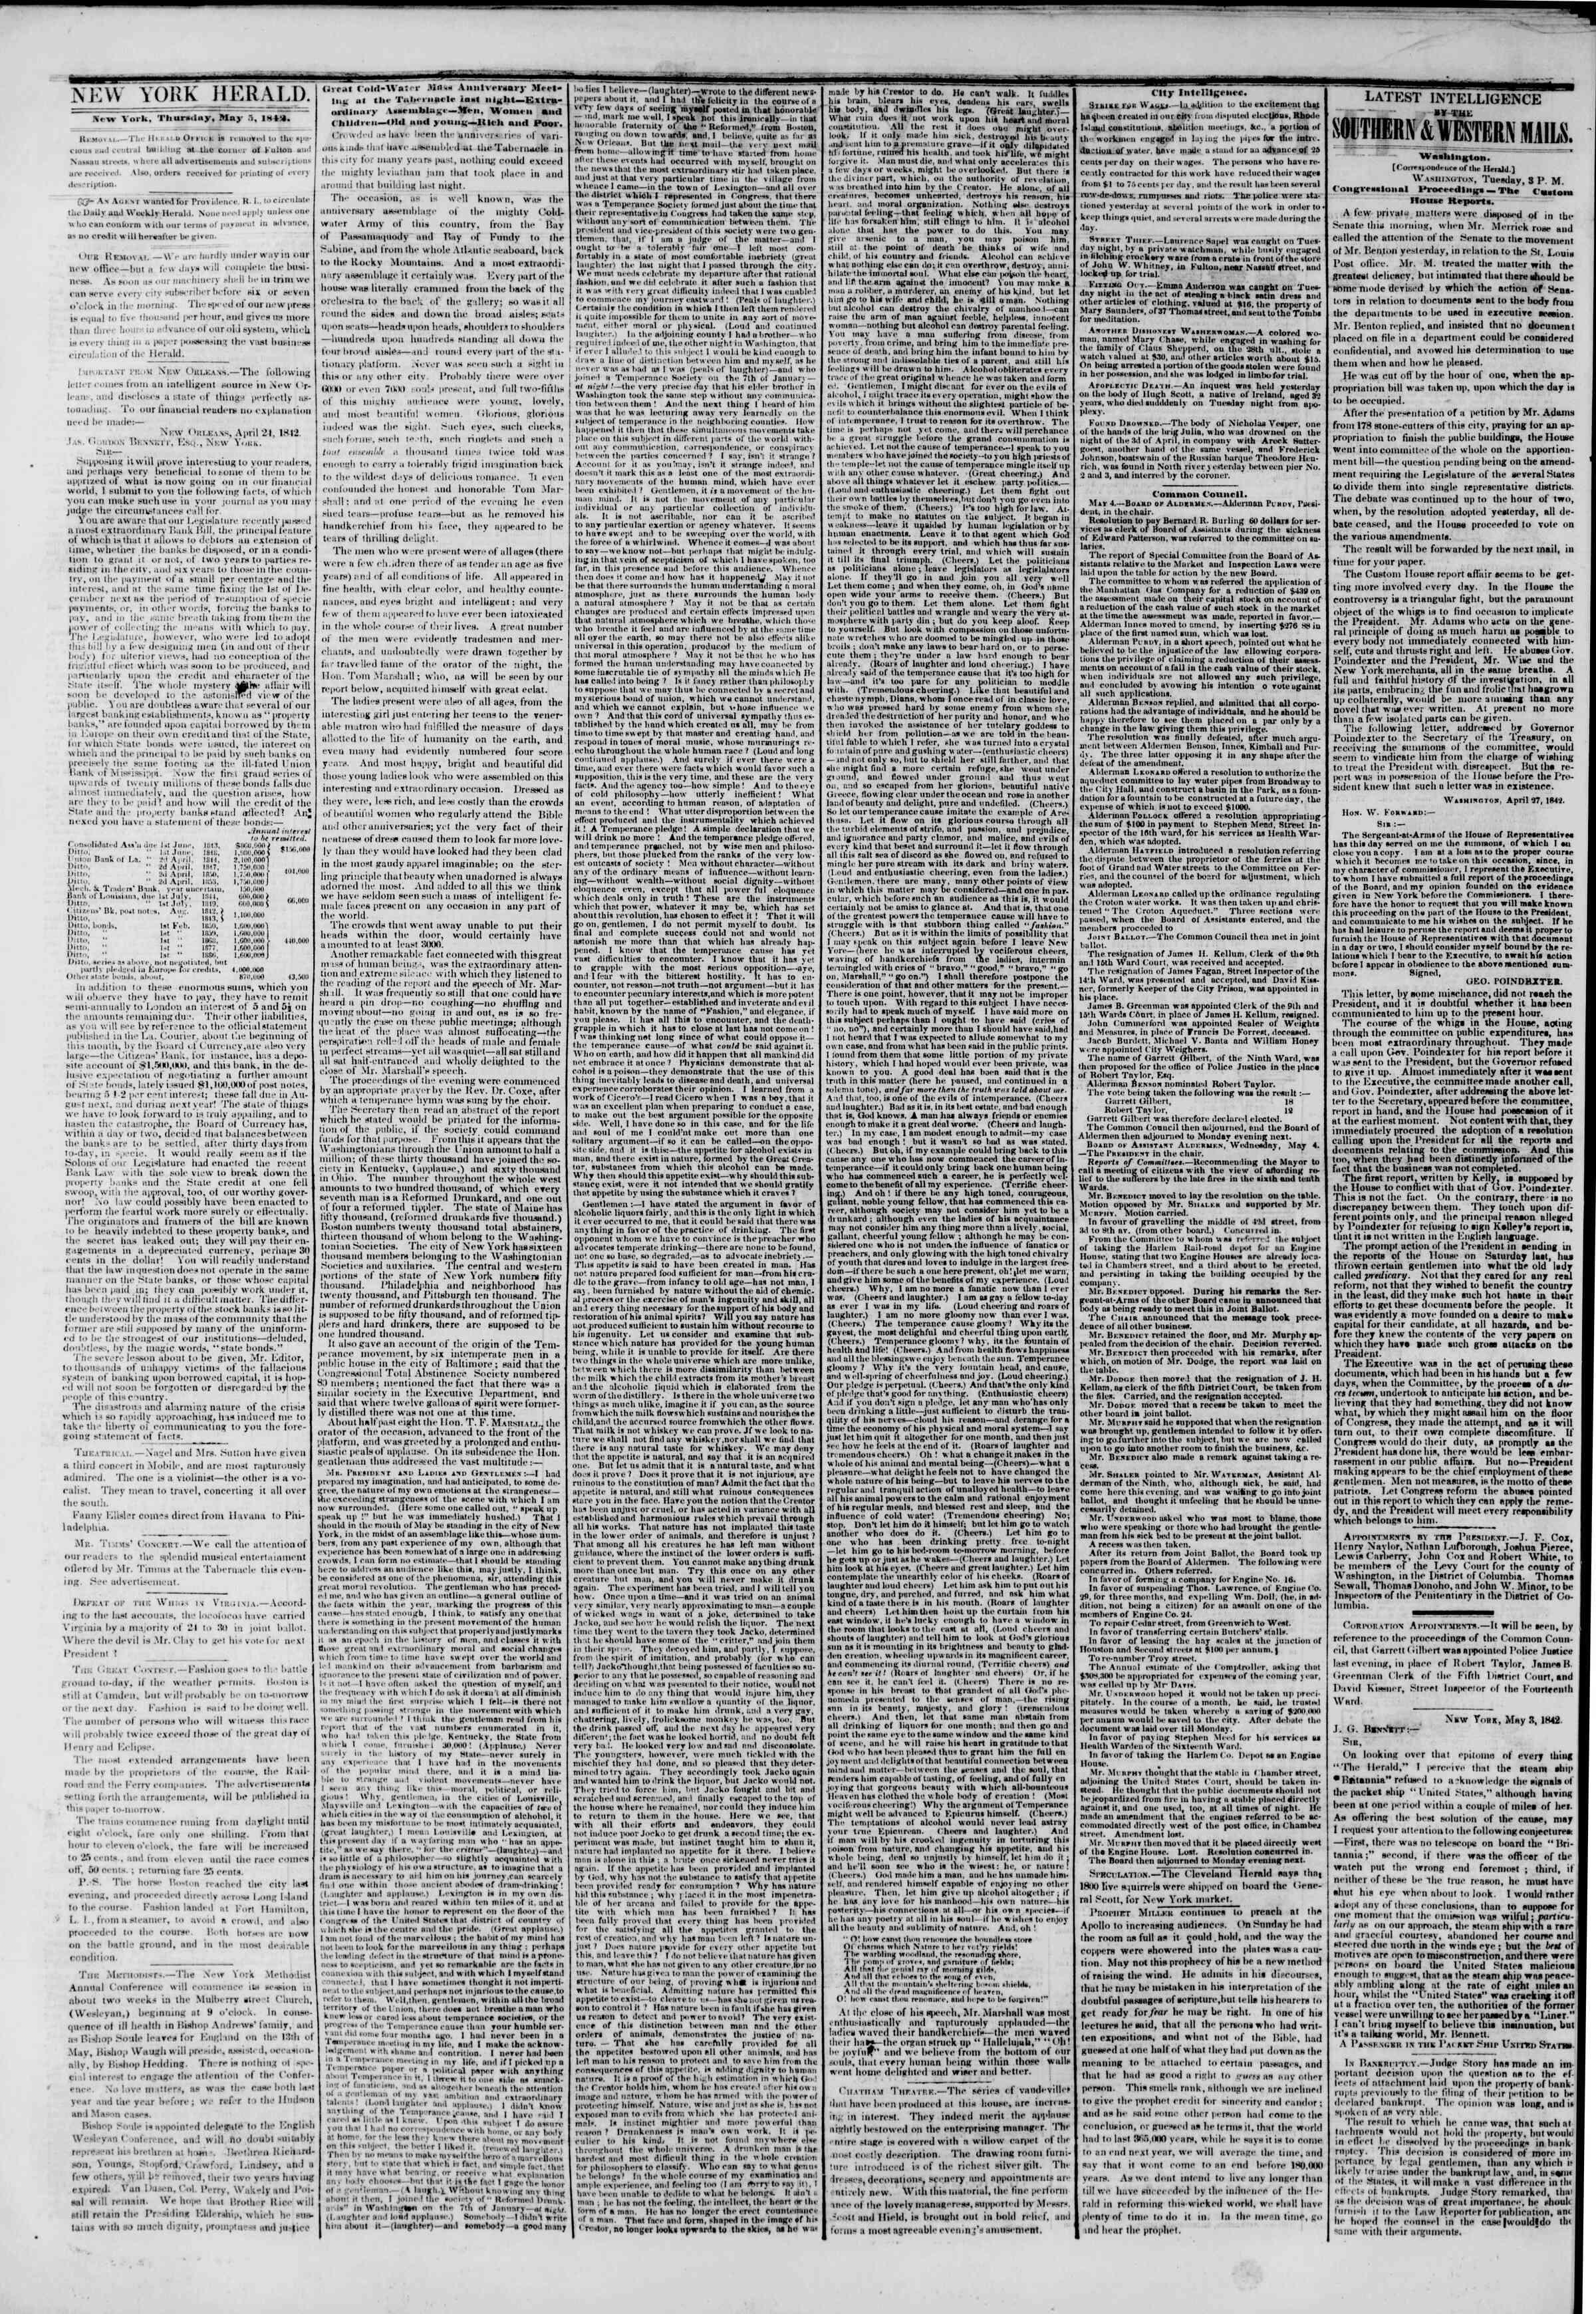 May 5, 1842 Tarihli The New York Herald Gazetesi Sayfa 2